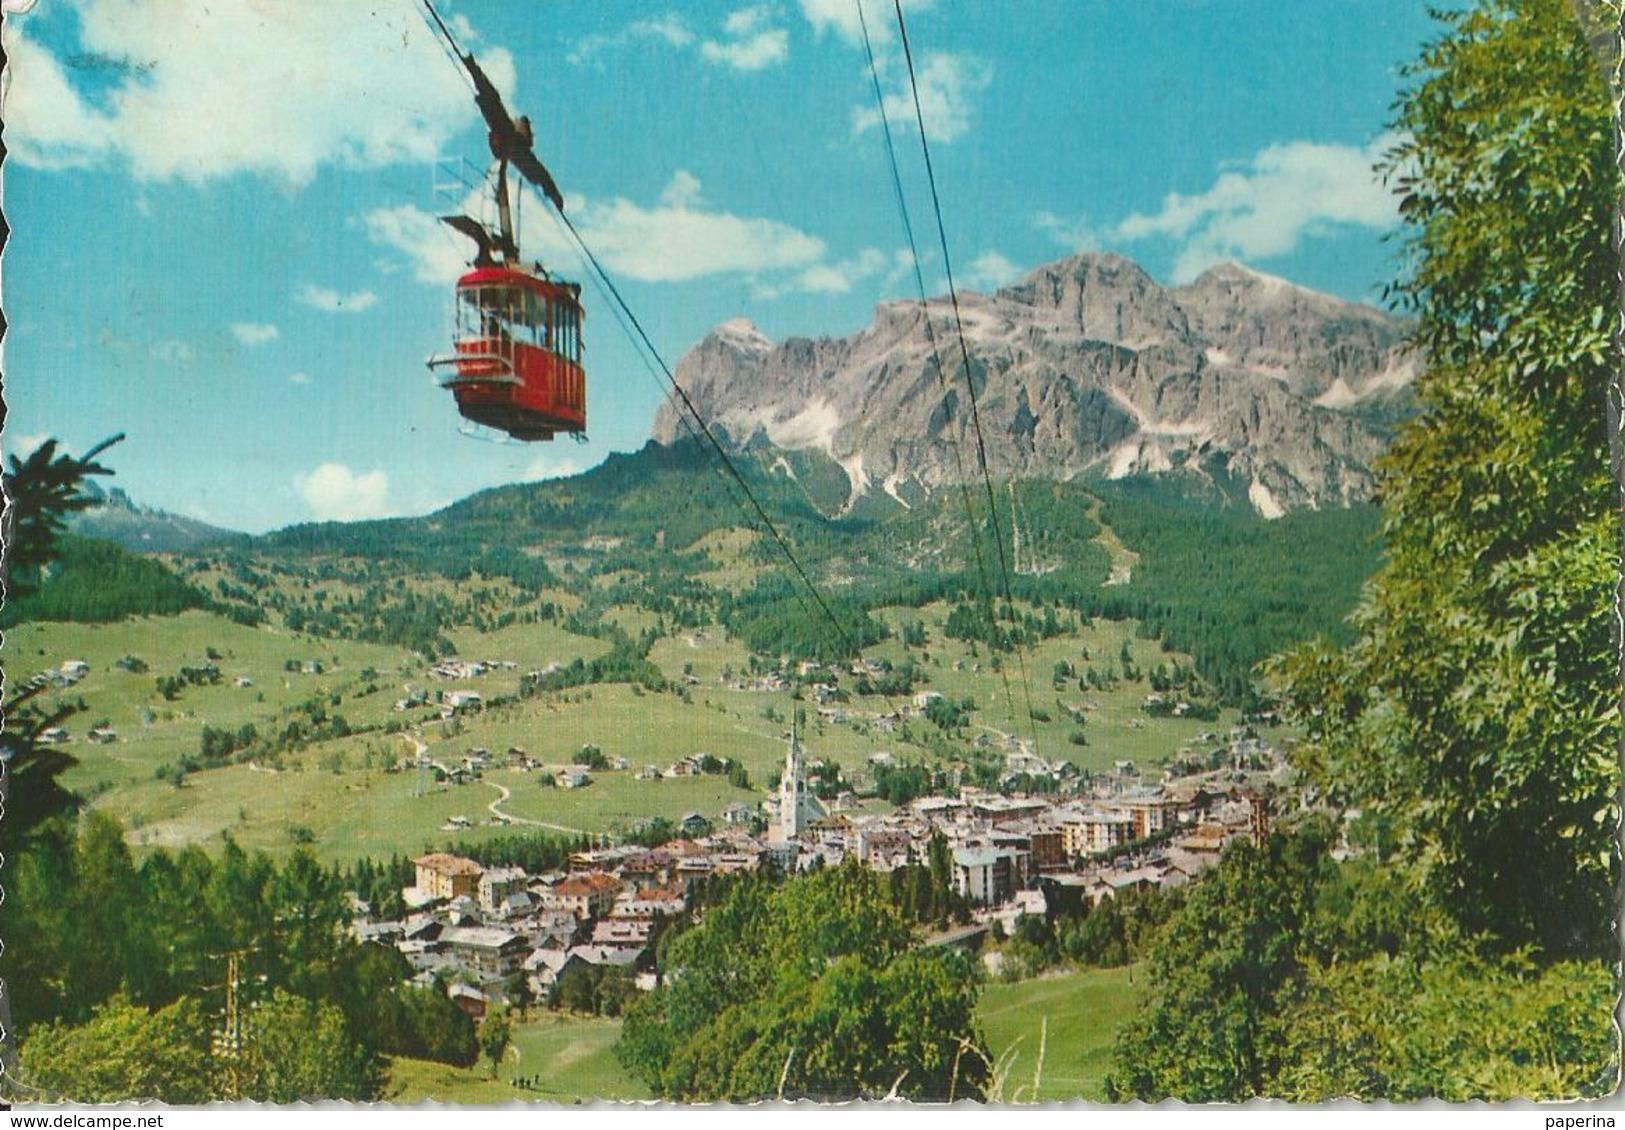 CORTINA FUNIVIA CORTINA - FALORIA (217) - Cartoline